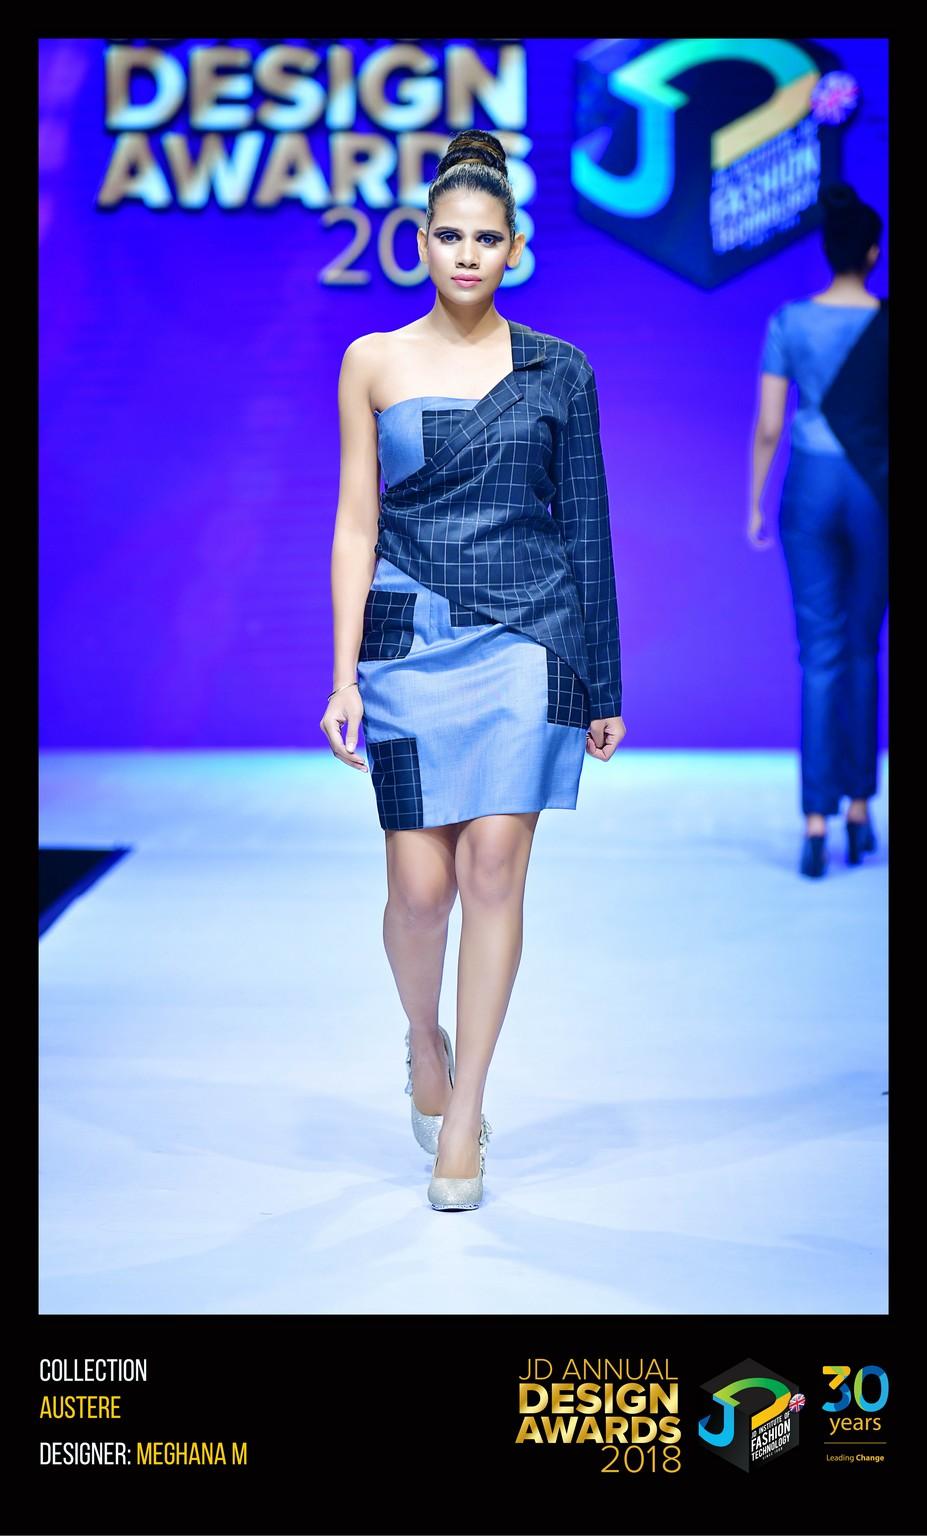 Austere – Change – JD Annual Design Awards 2018   Designer: Meghana   Photography : Jerin Nath (@jerin_nath) austere - AUSTERE4 - Austere – Change – JD Annual Design Awards 2018